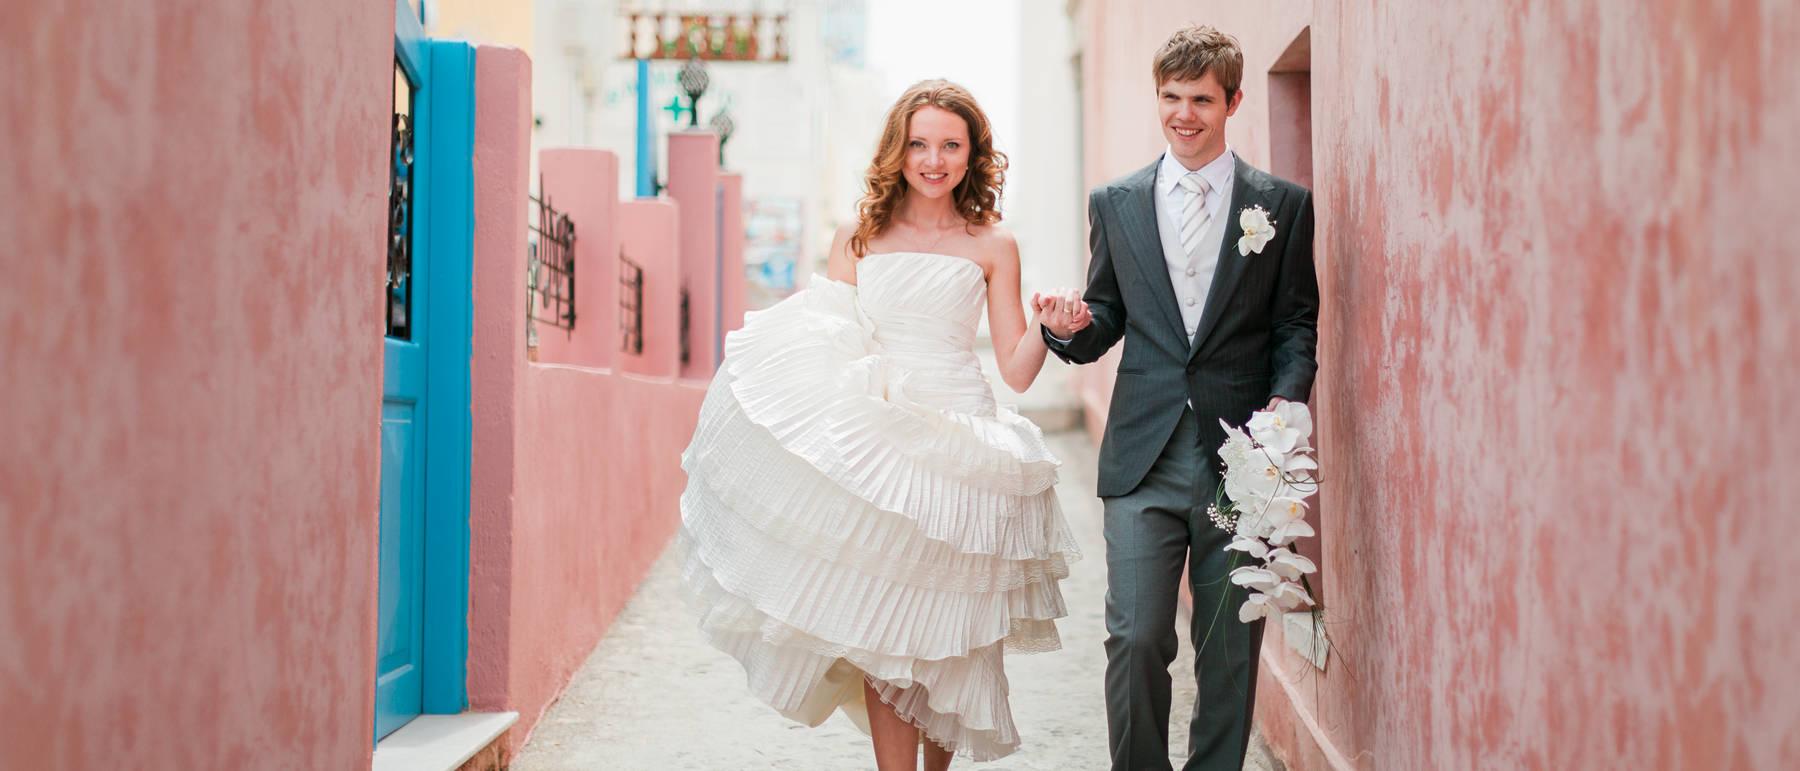 johnandjoseph-wedding-photographer-hz-slider-251